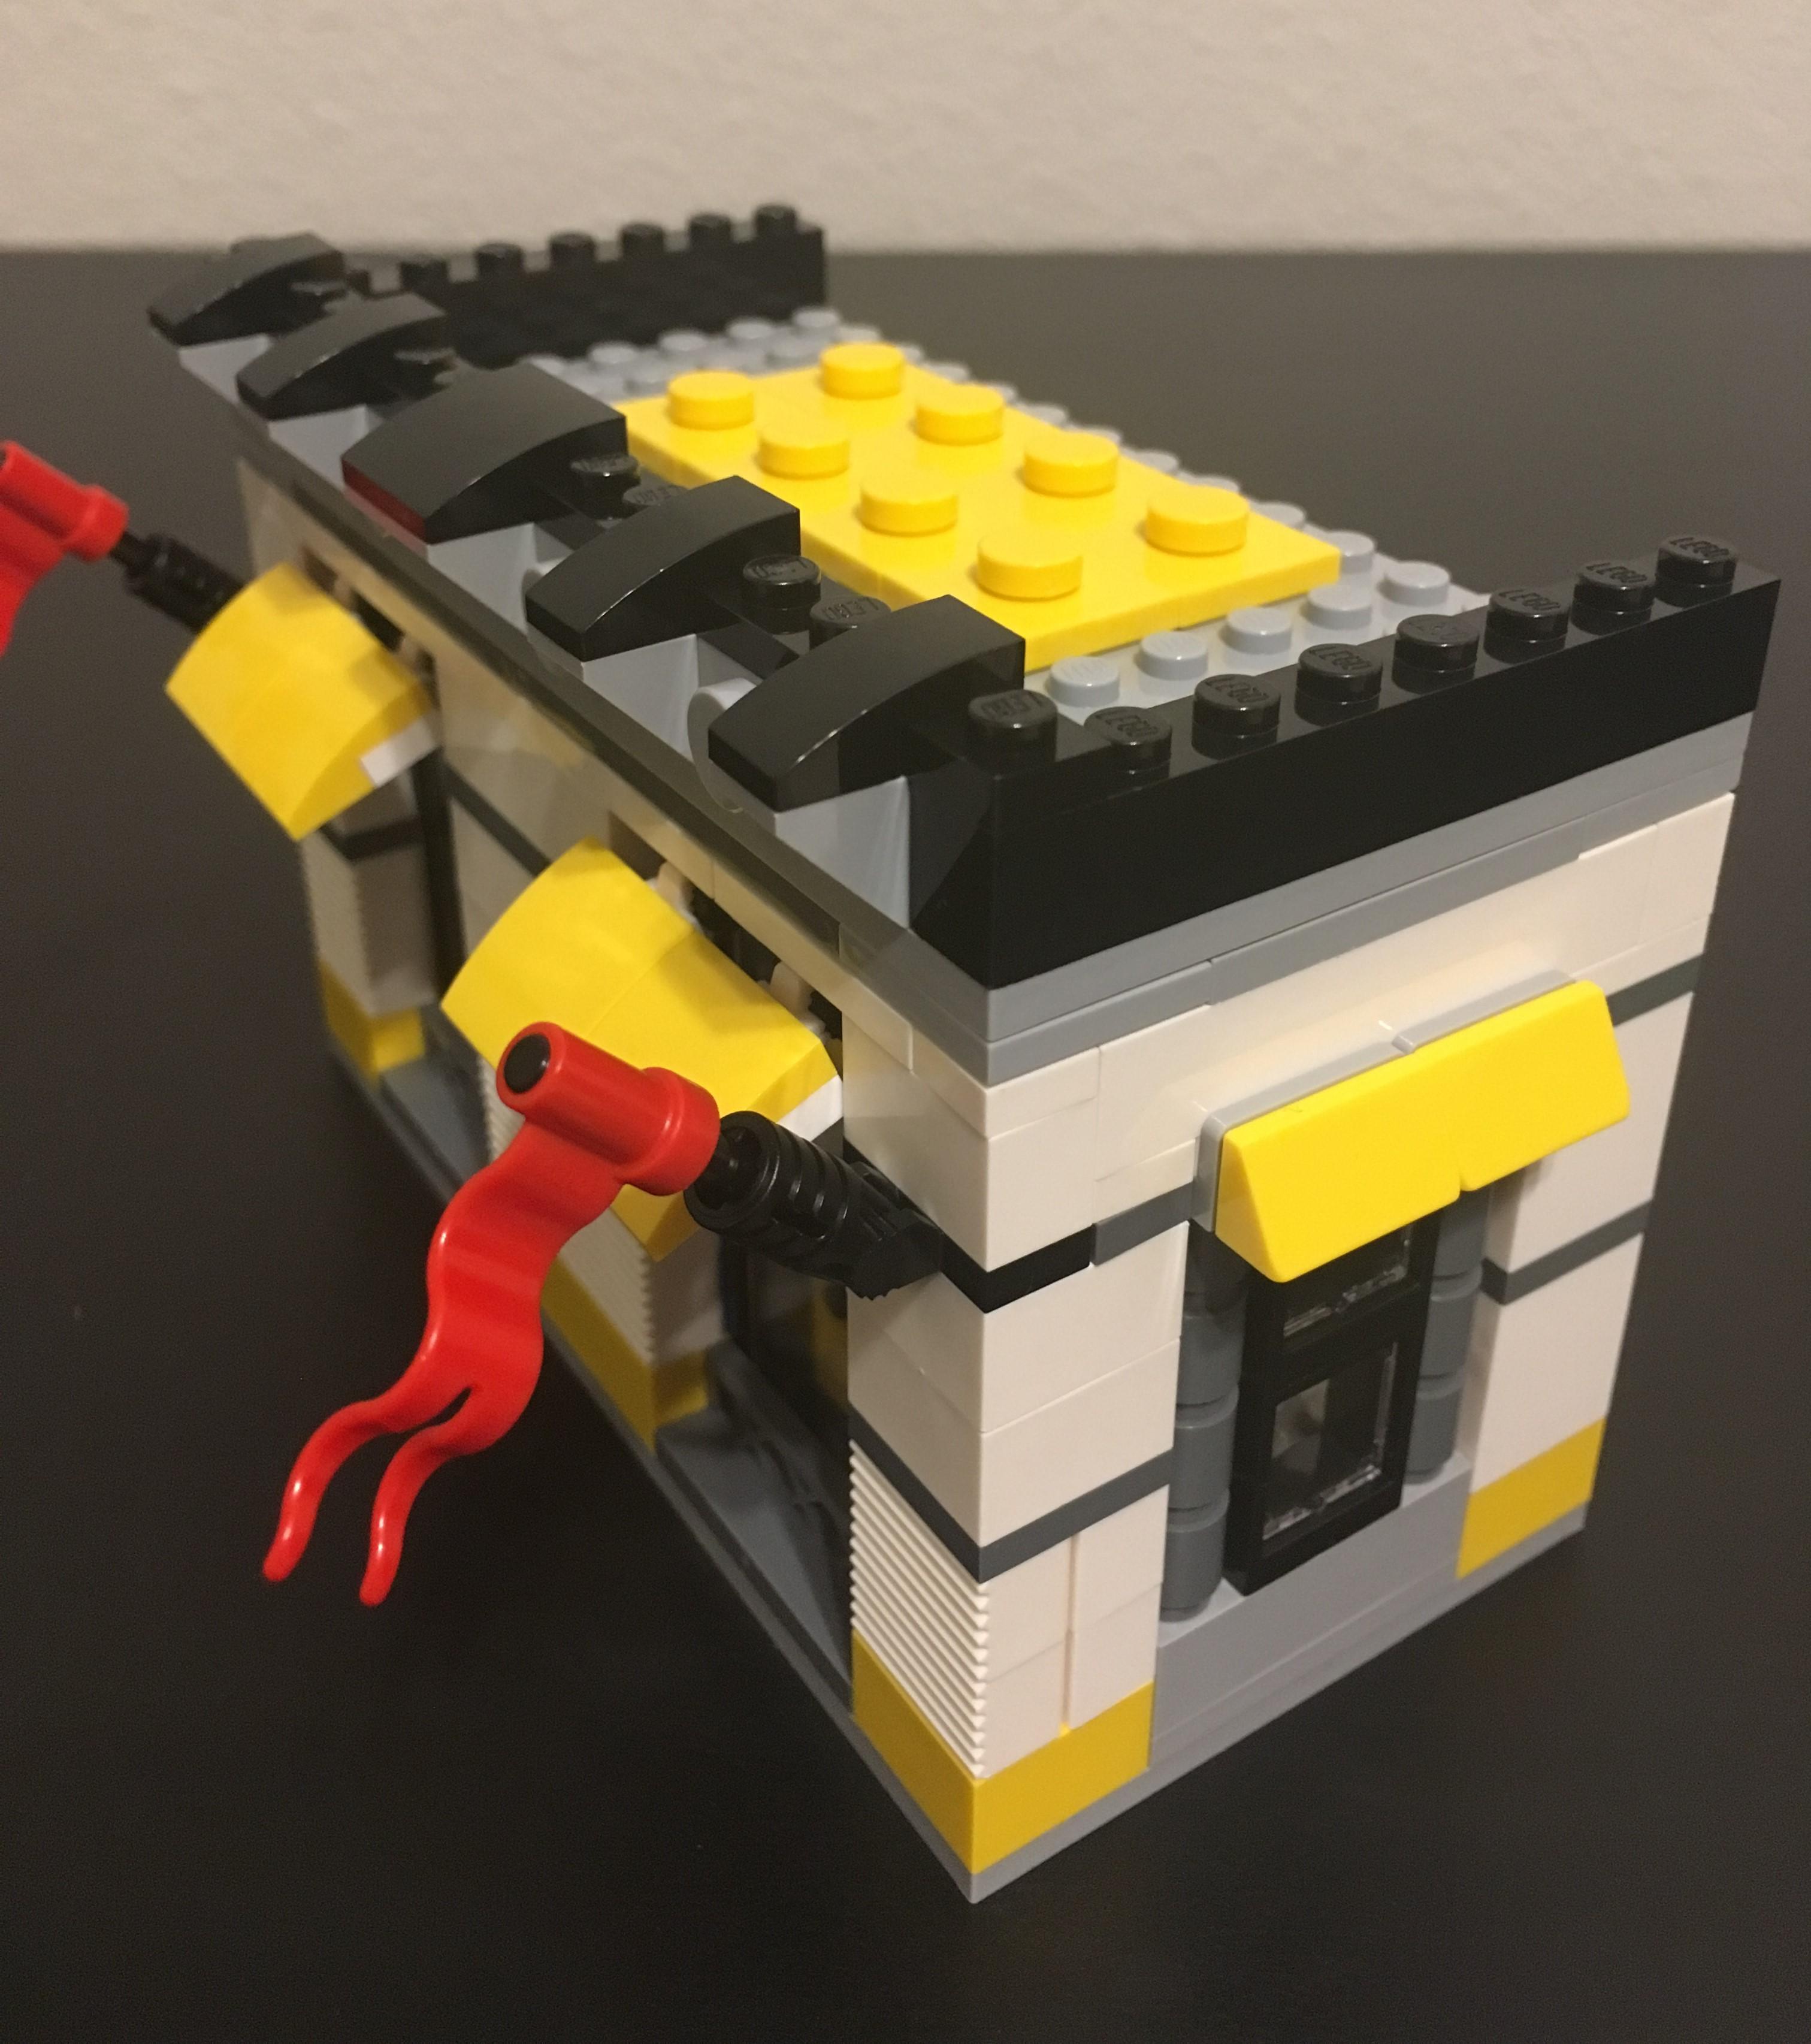 ʀᴇᴠɪᴇᴡ 40305 Lego Brand Store Brick Architect